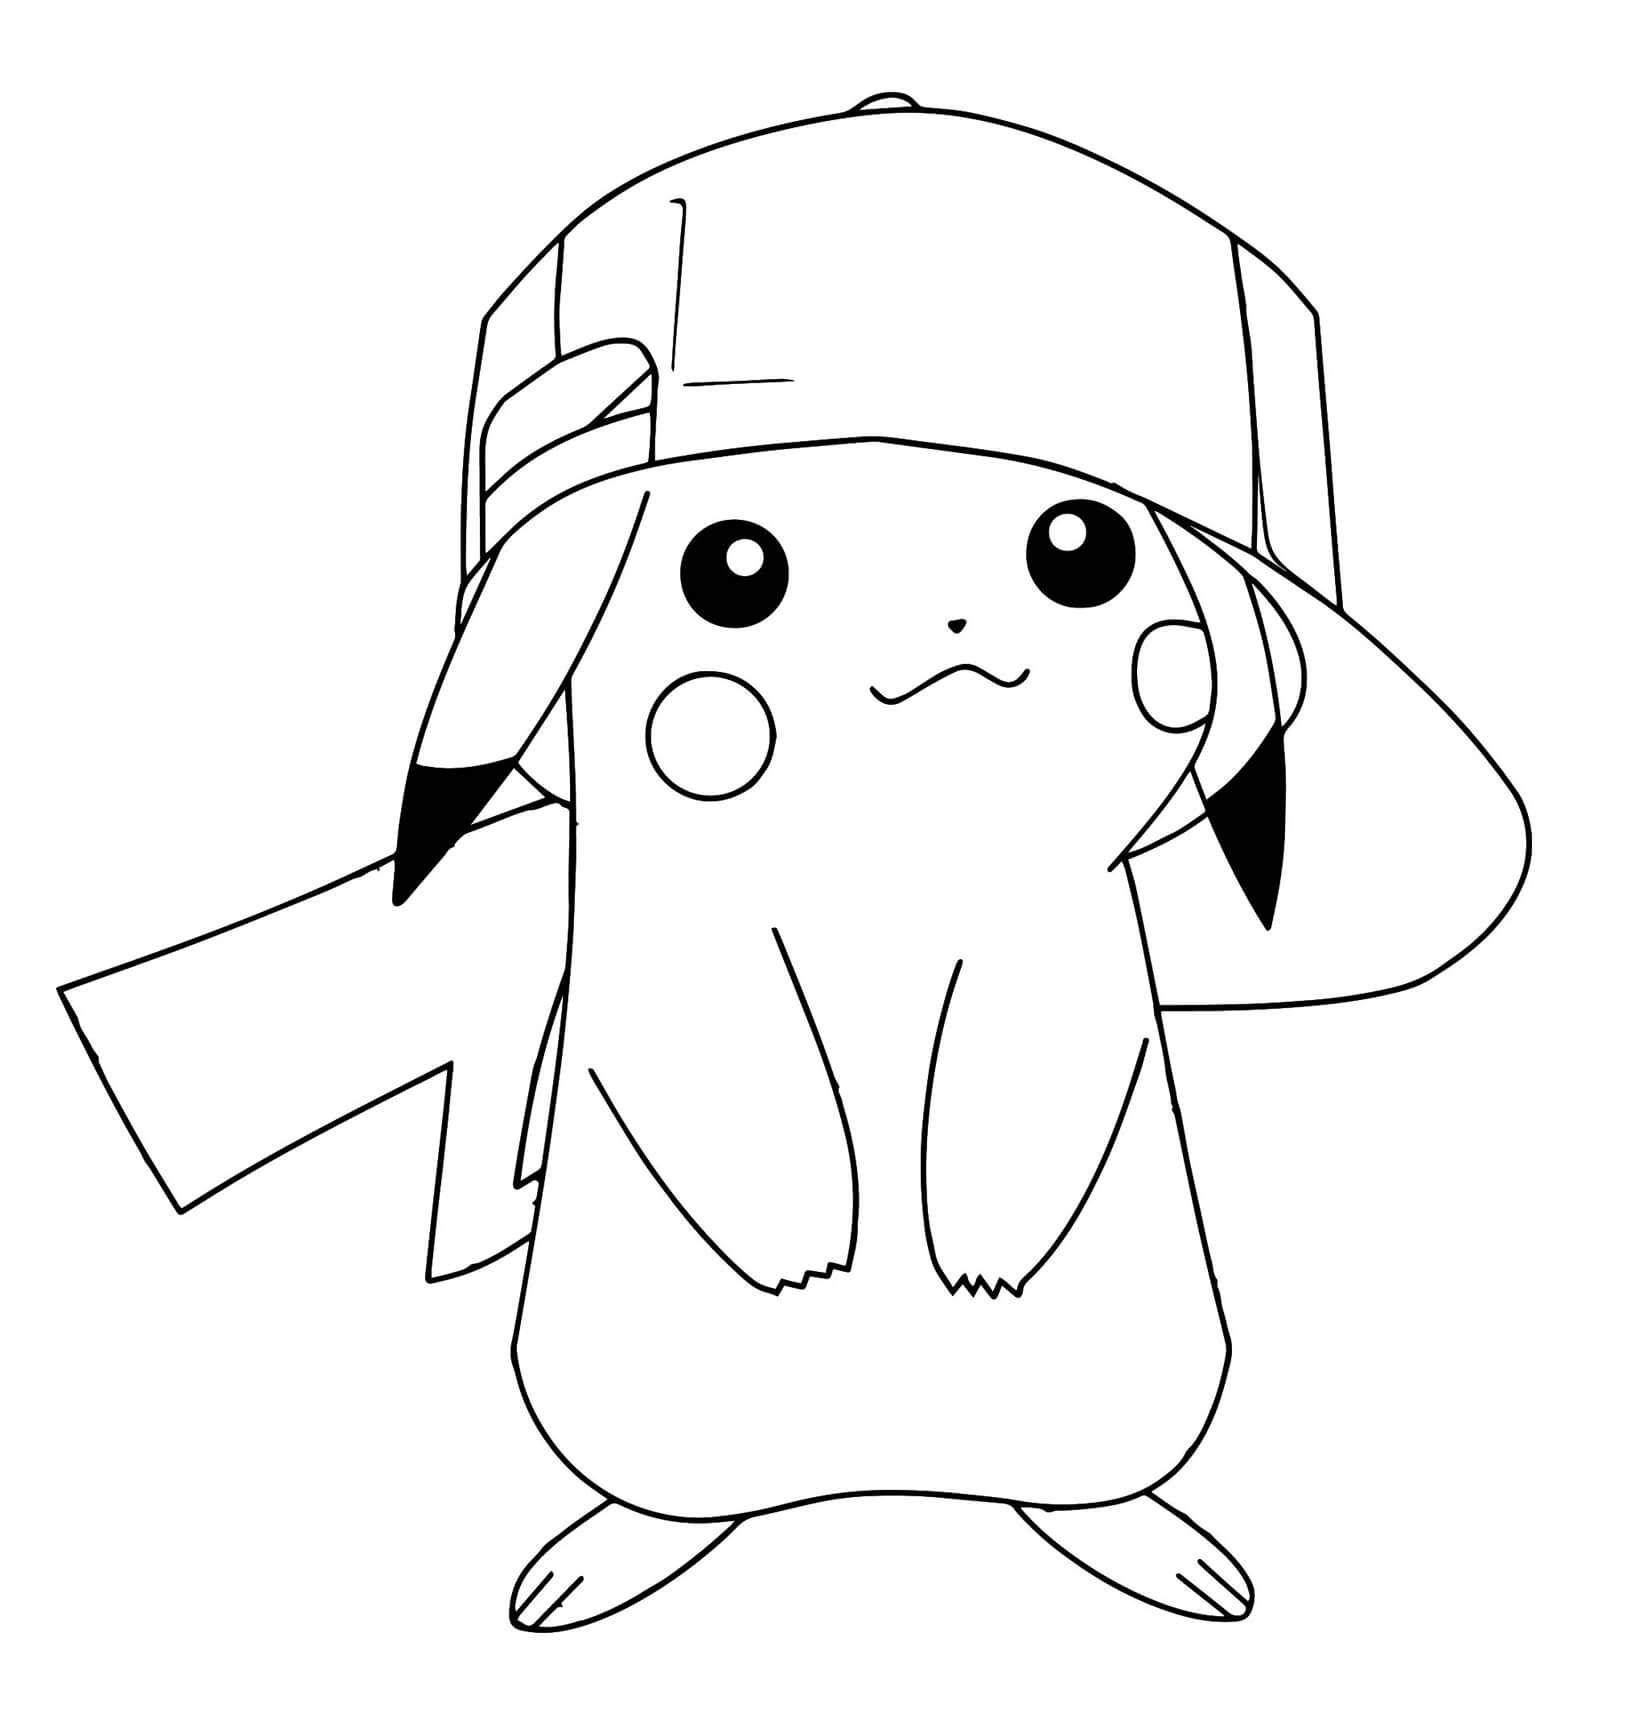 Pikachu-Ausmalbilder.jpg (1646×1725) | pikachu | Pinterest  Pikachu-Ausmalb...